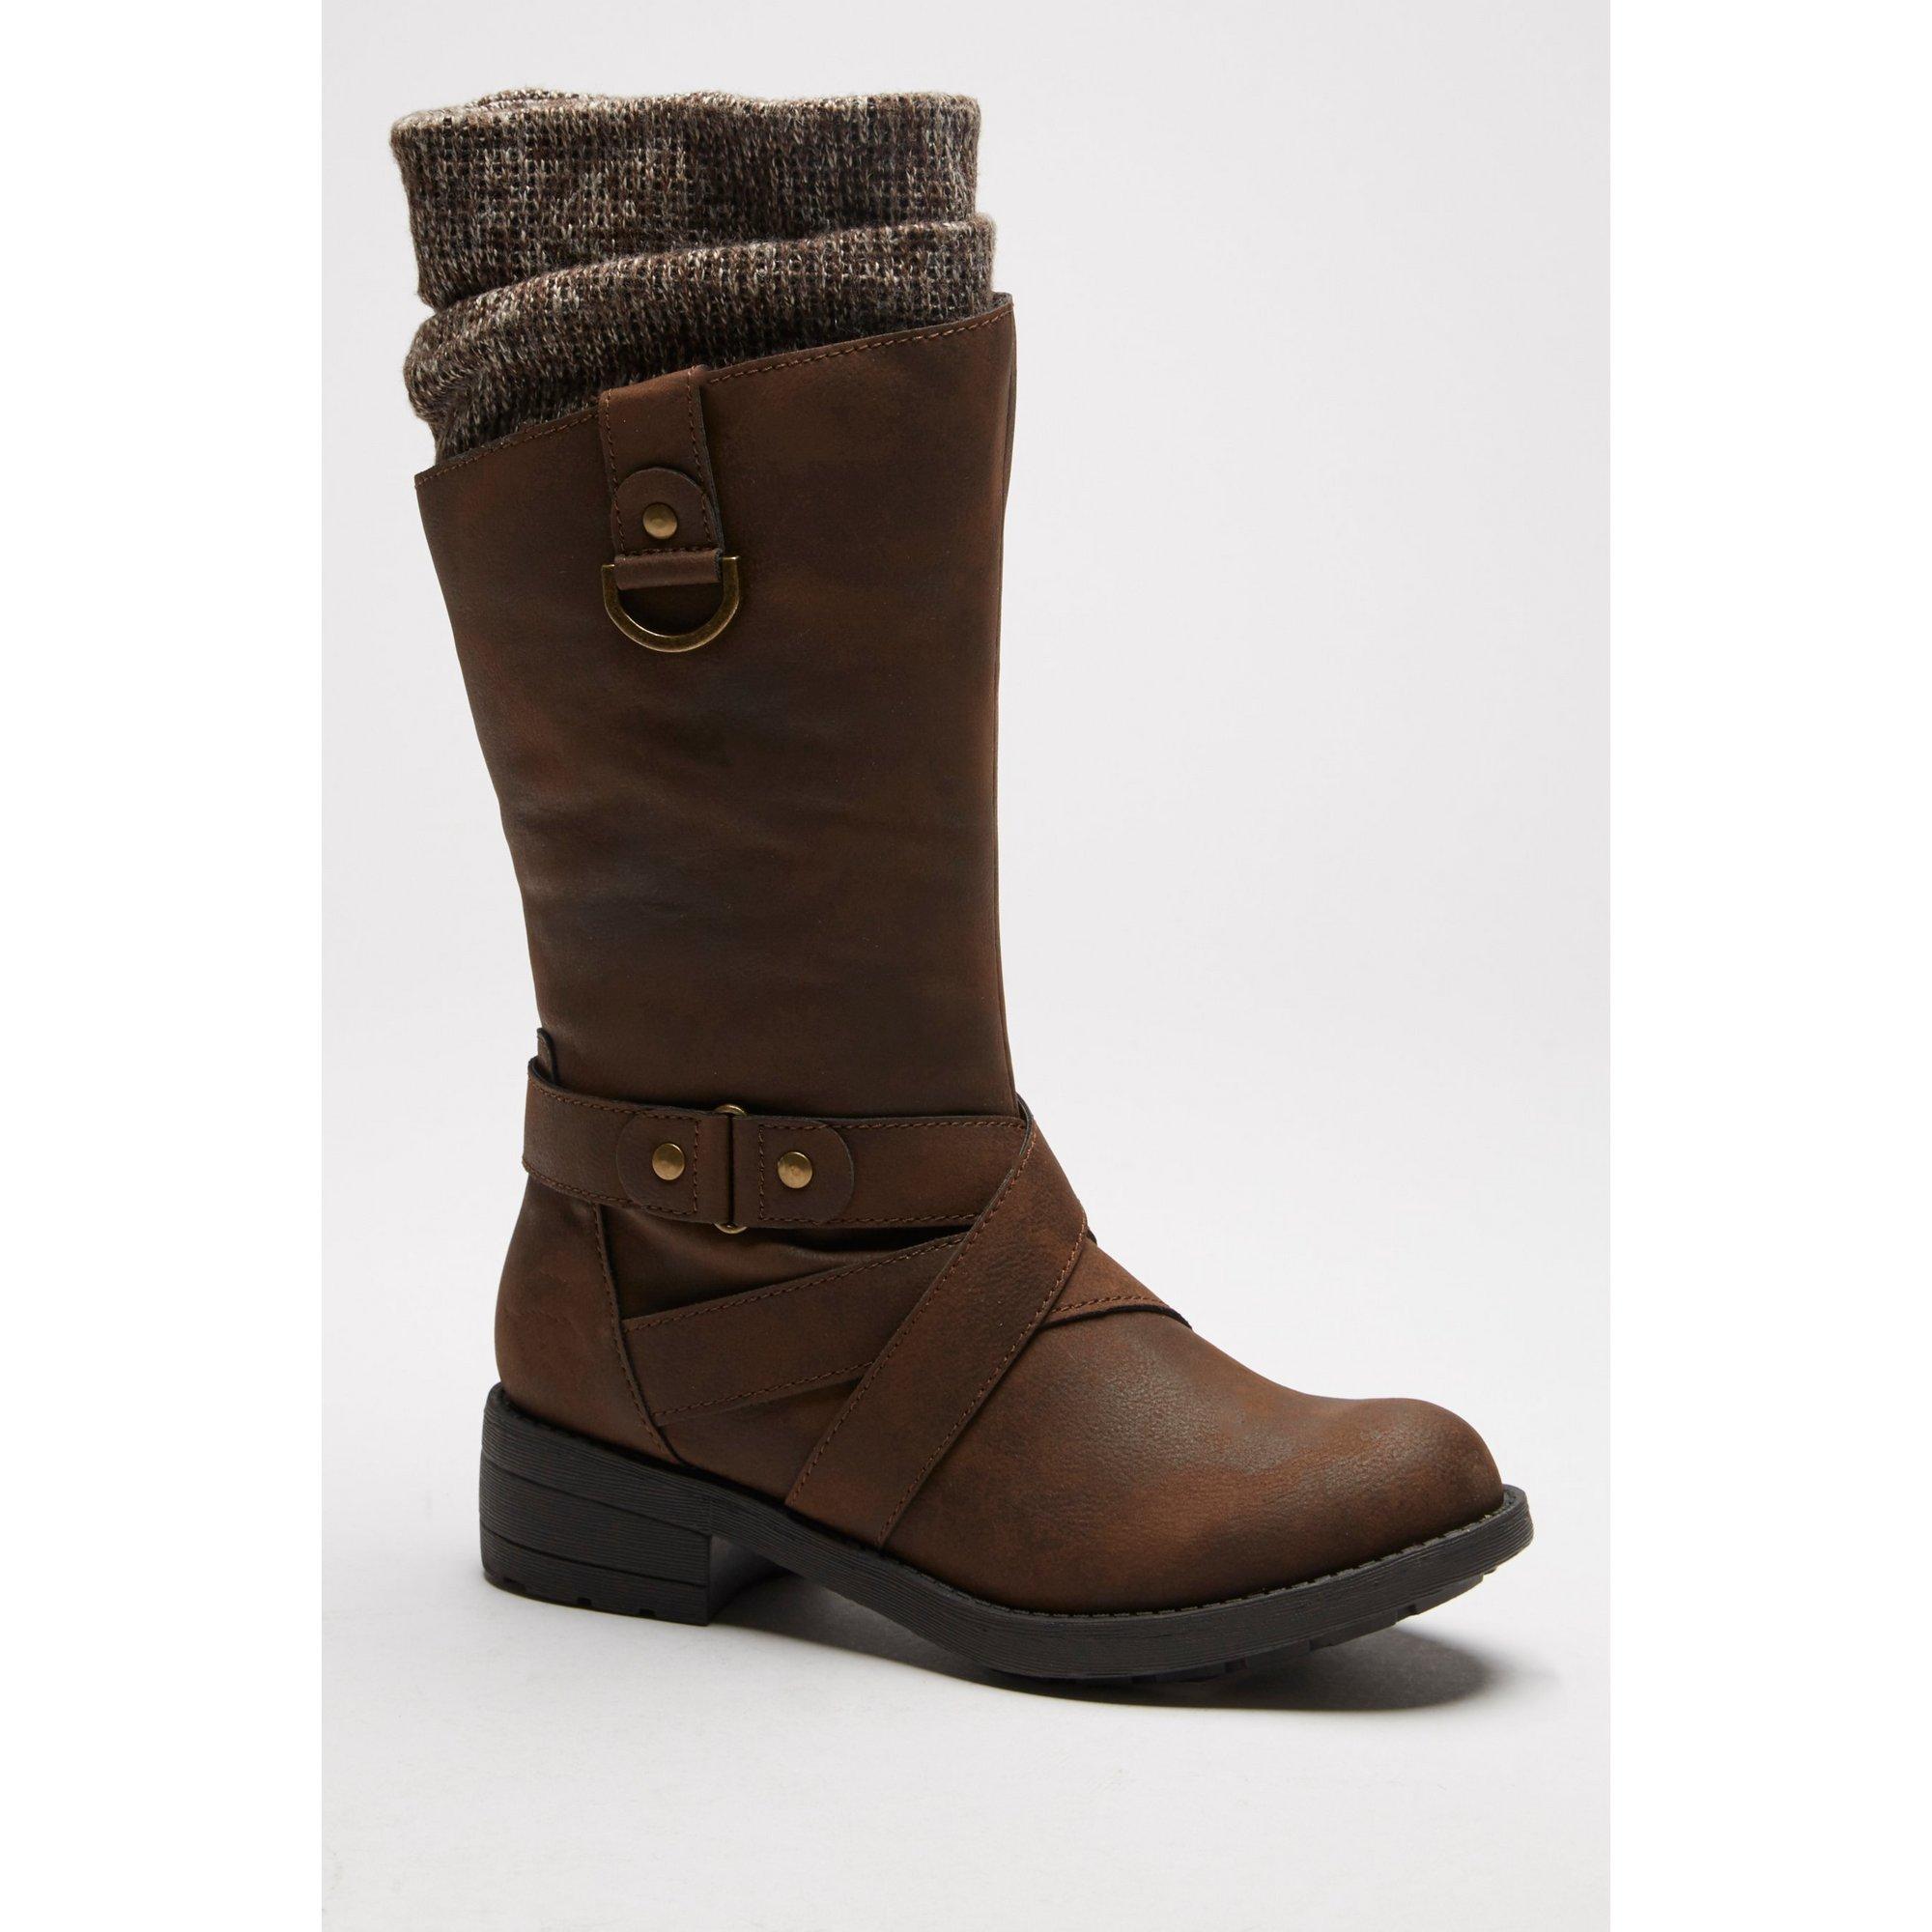 Rocket Dog Telsa Knitted Collar Brown Boots